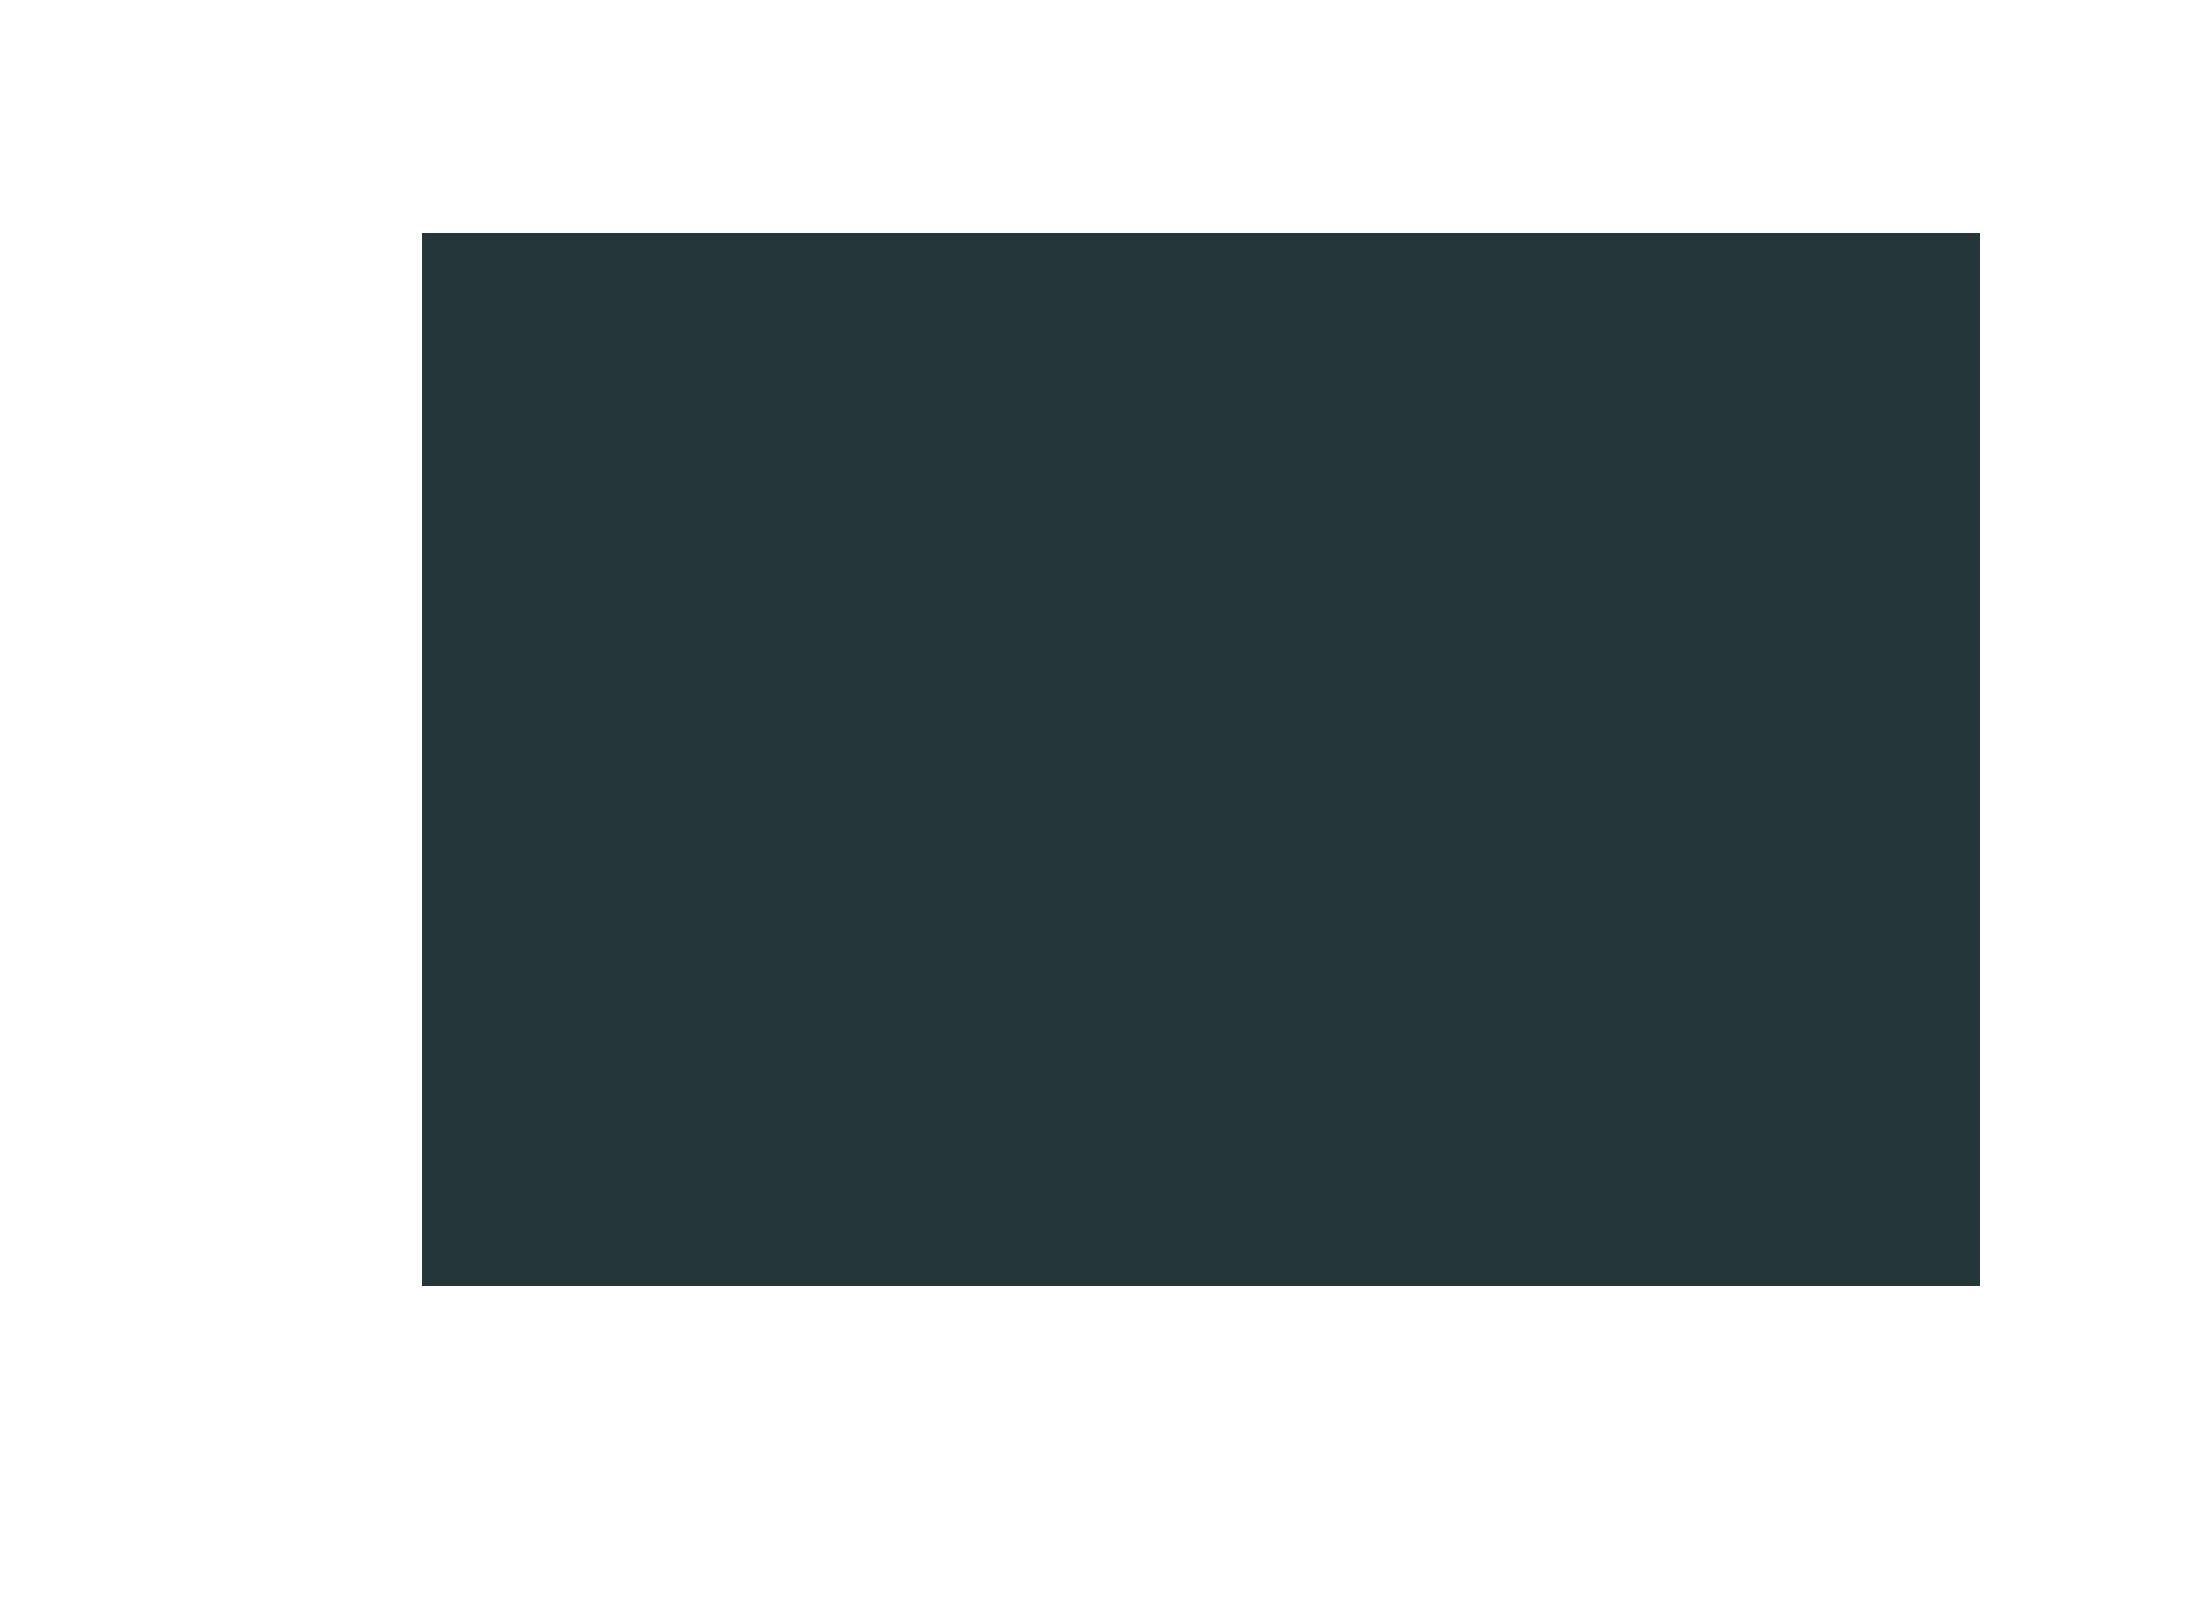 profitplanner-logo01.png